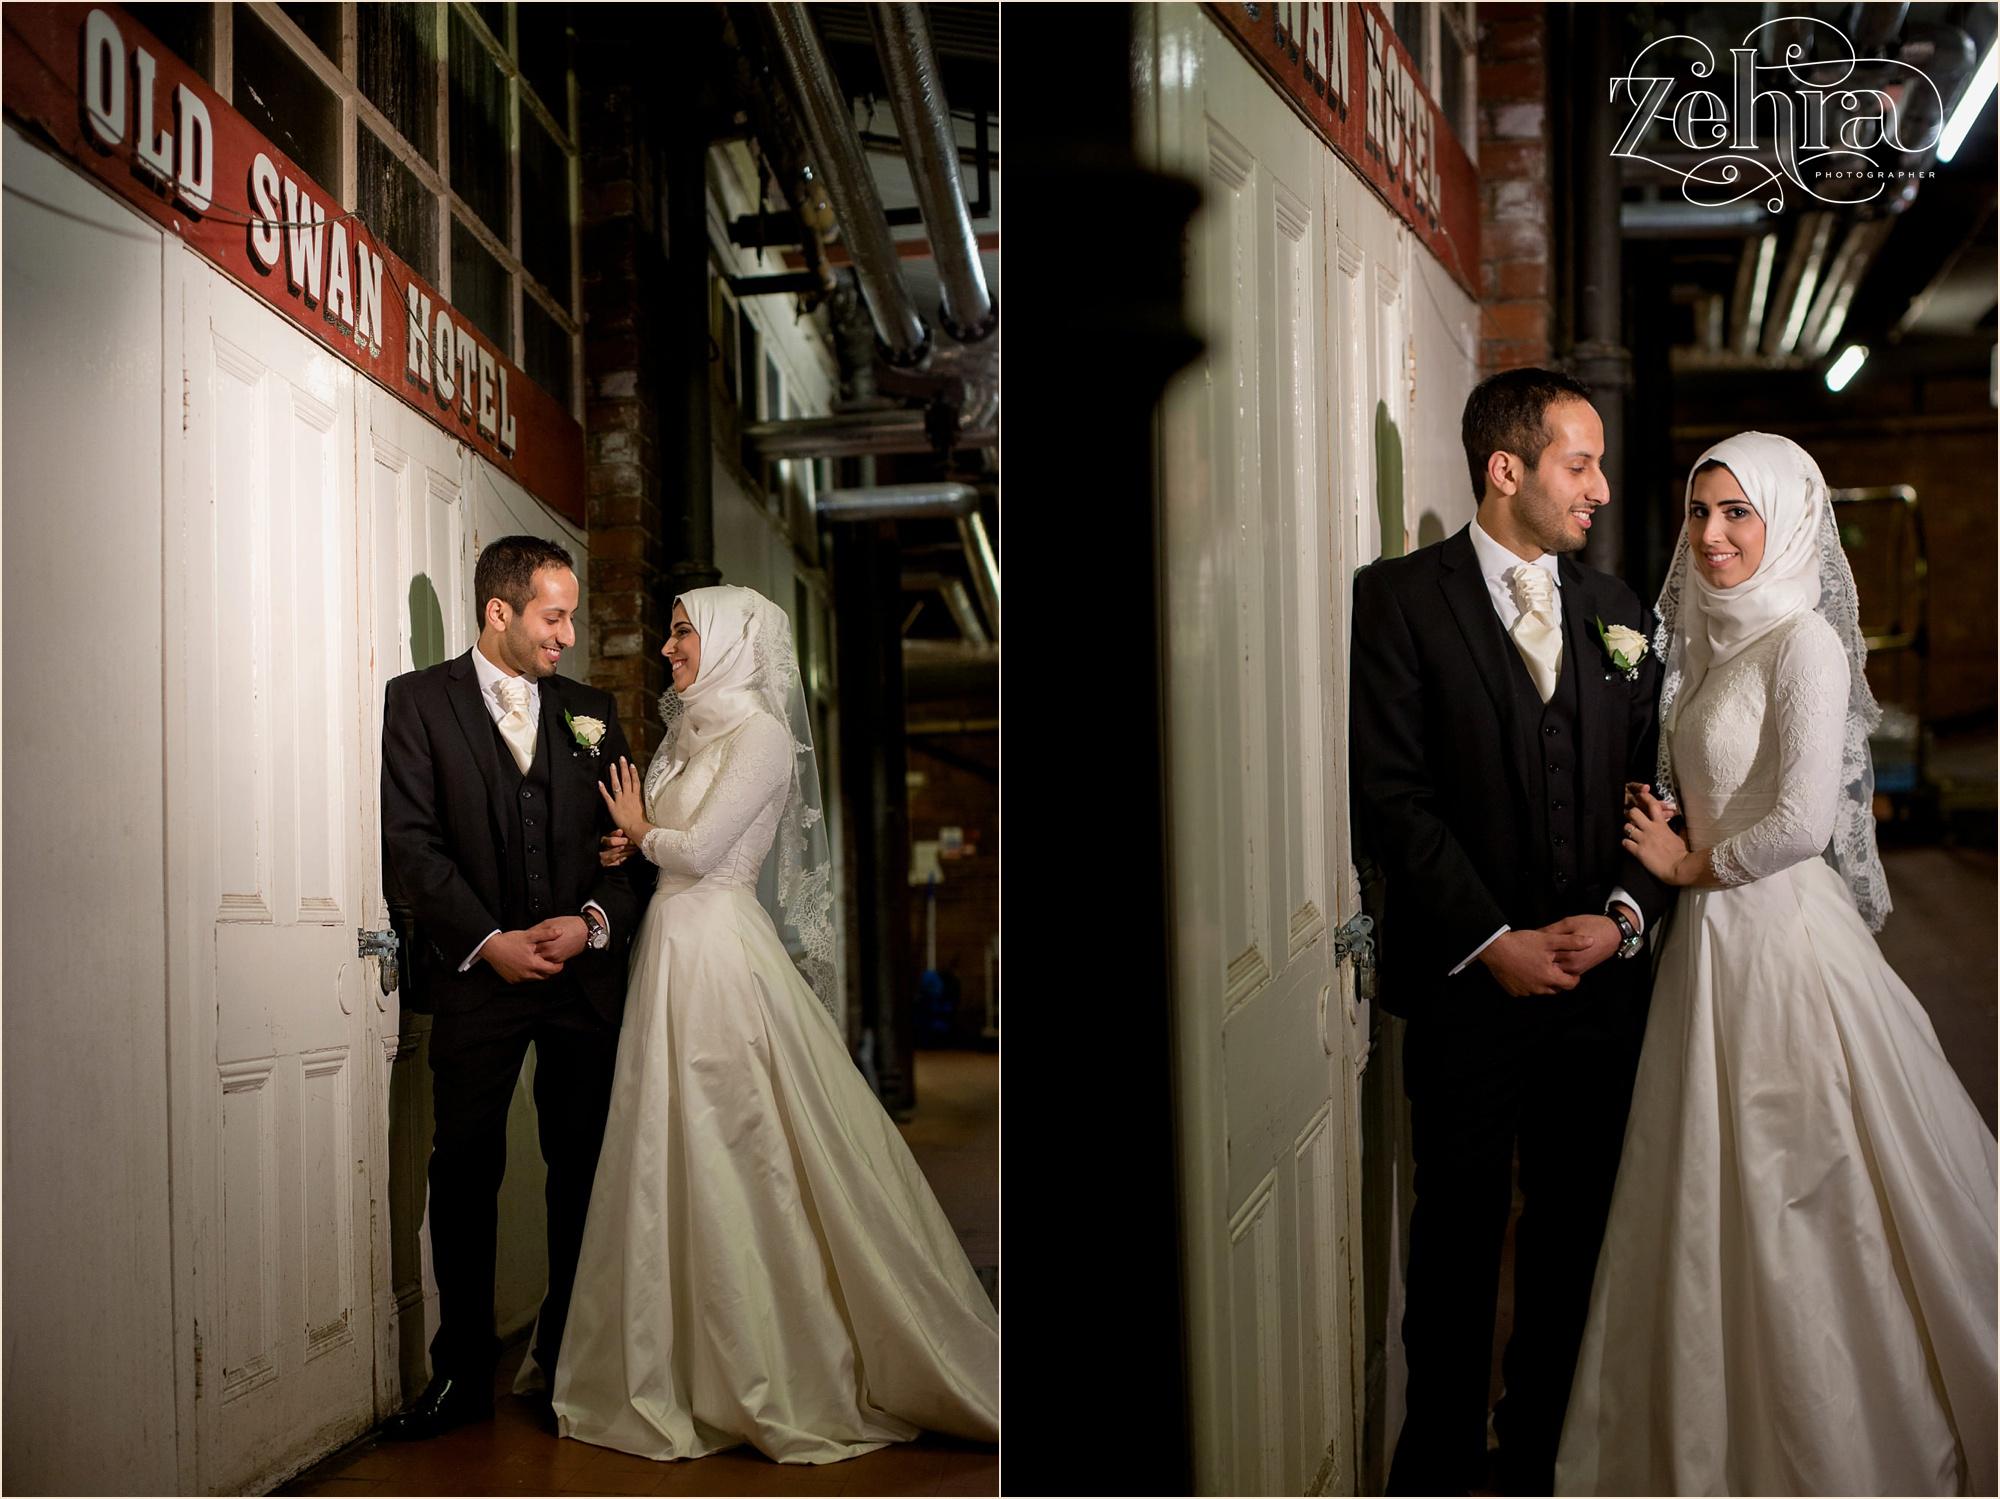 jasira manchester wedding photographer_0087.jpg